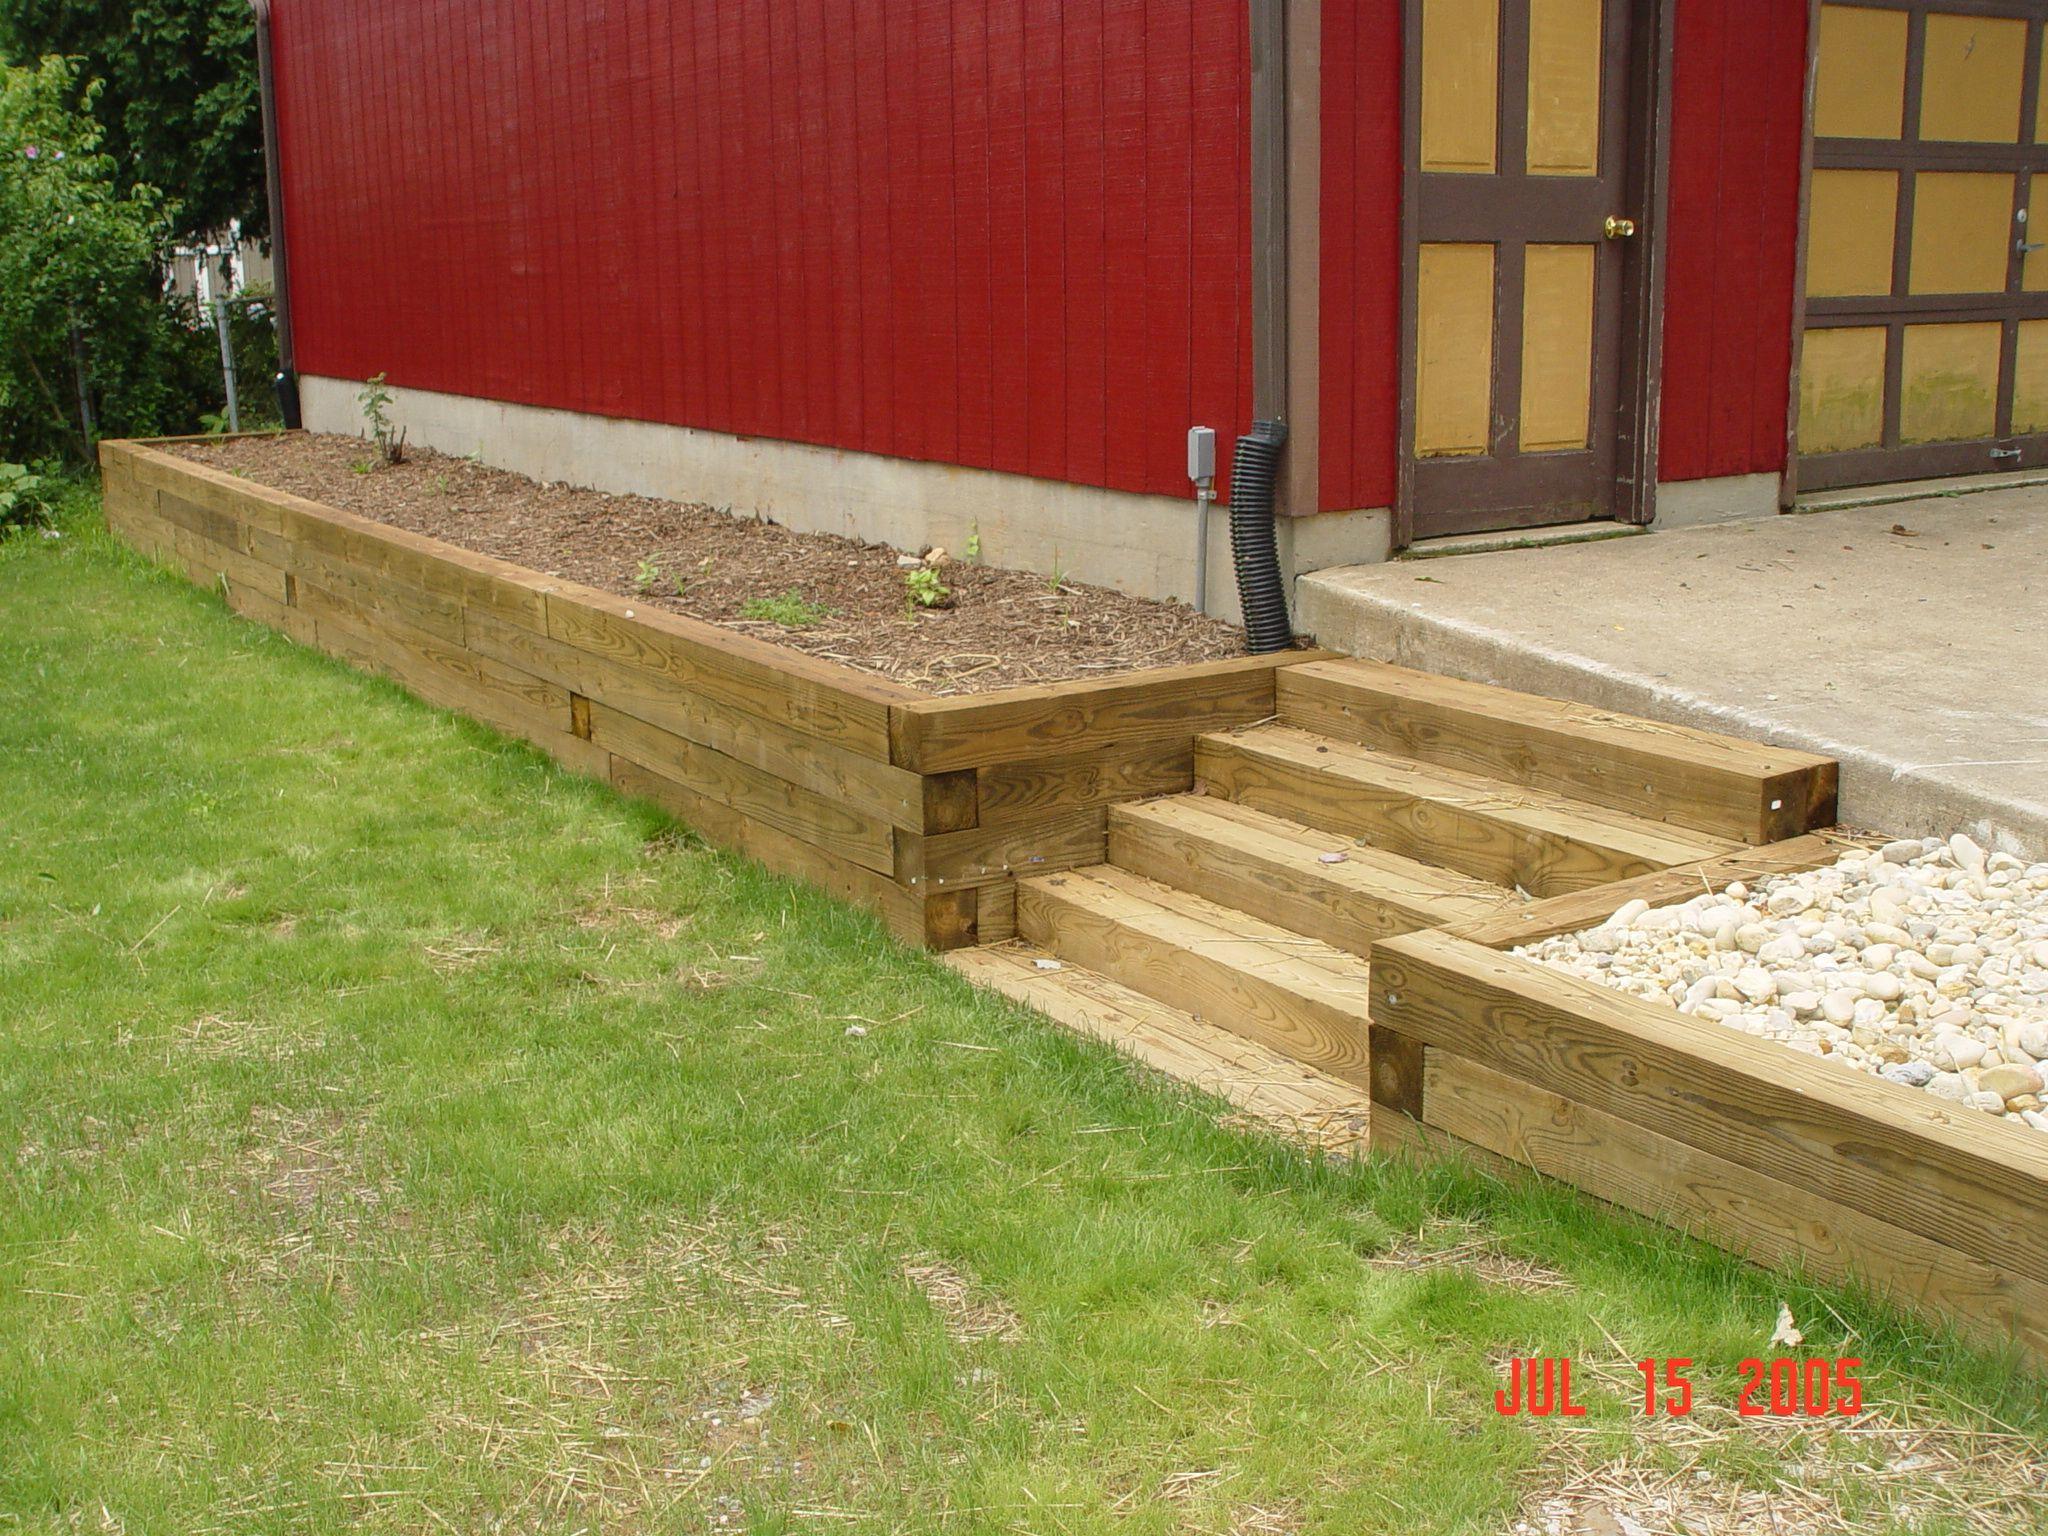 Wood Retaining Wall Design Example Retainingwallideas Mur De Soutenement Idees Exterieures Exterieur